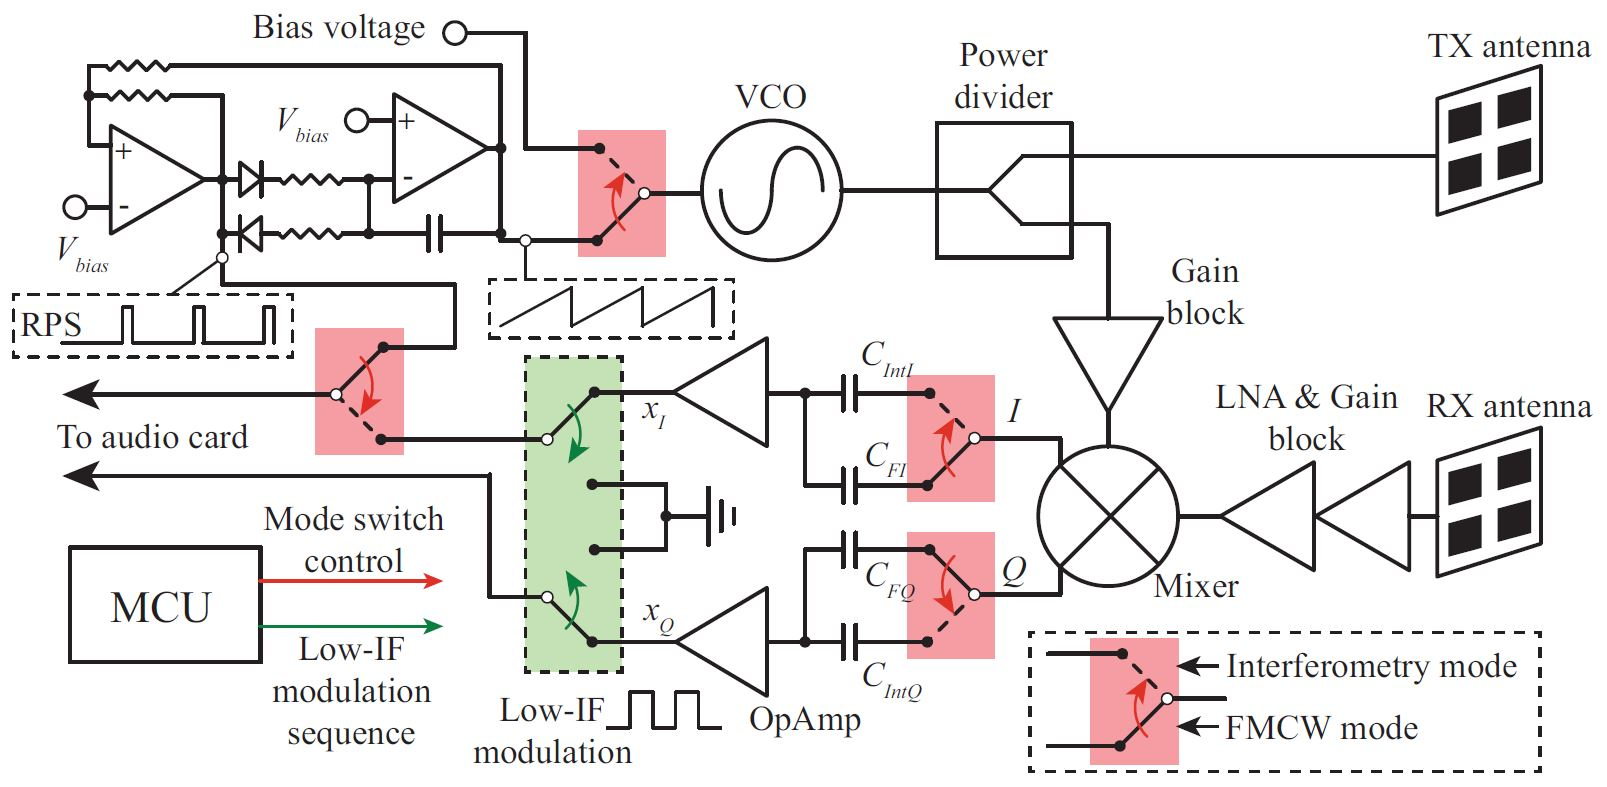 Fig. 1. Block diagram of the 5.8-GHz multi-mode radar prototype